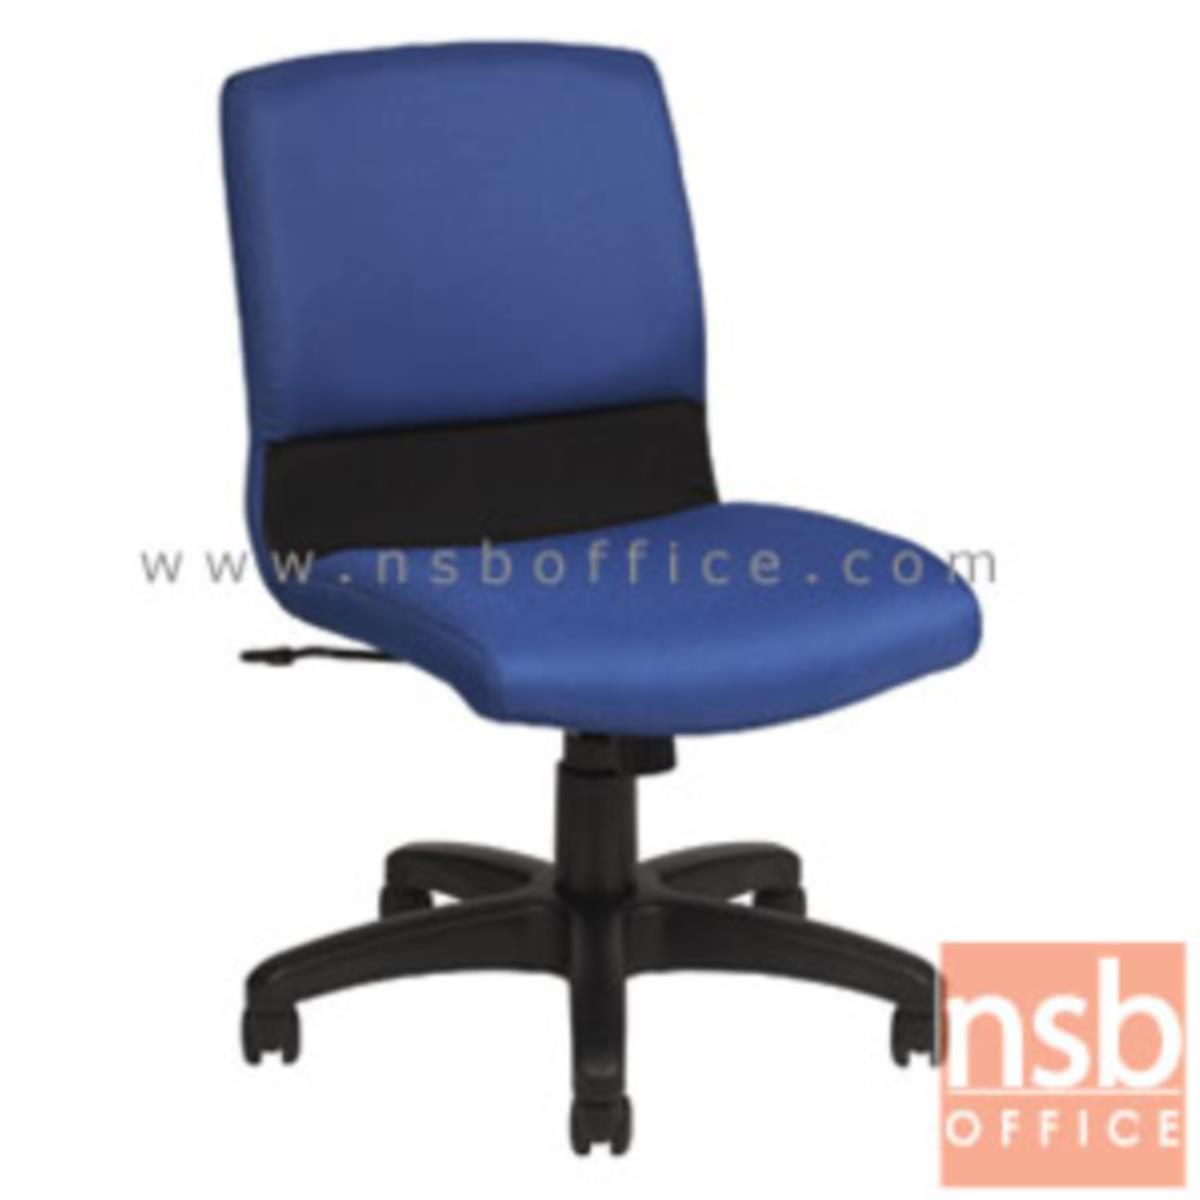 B03A359:เก้าอี้สำนักงาน รุ่น Toad (โธด)  โช๊คแก๊ส มีก้อนโยก ขาพลาสติก